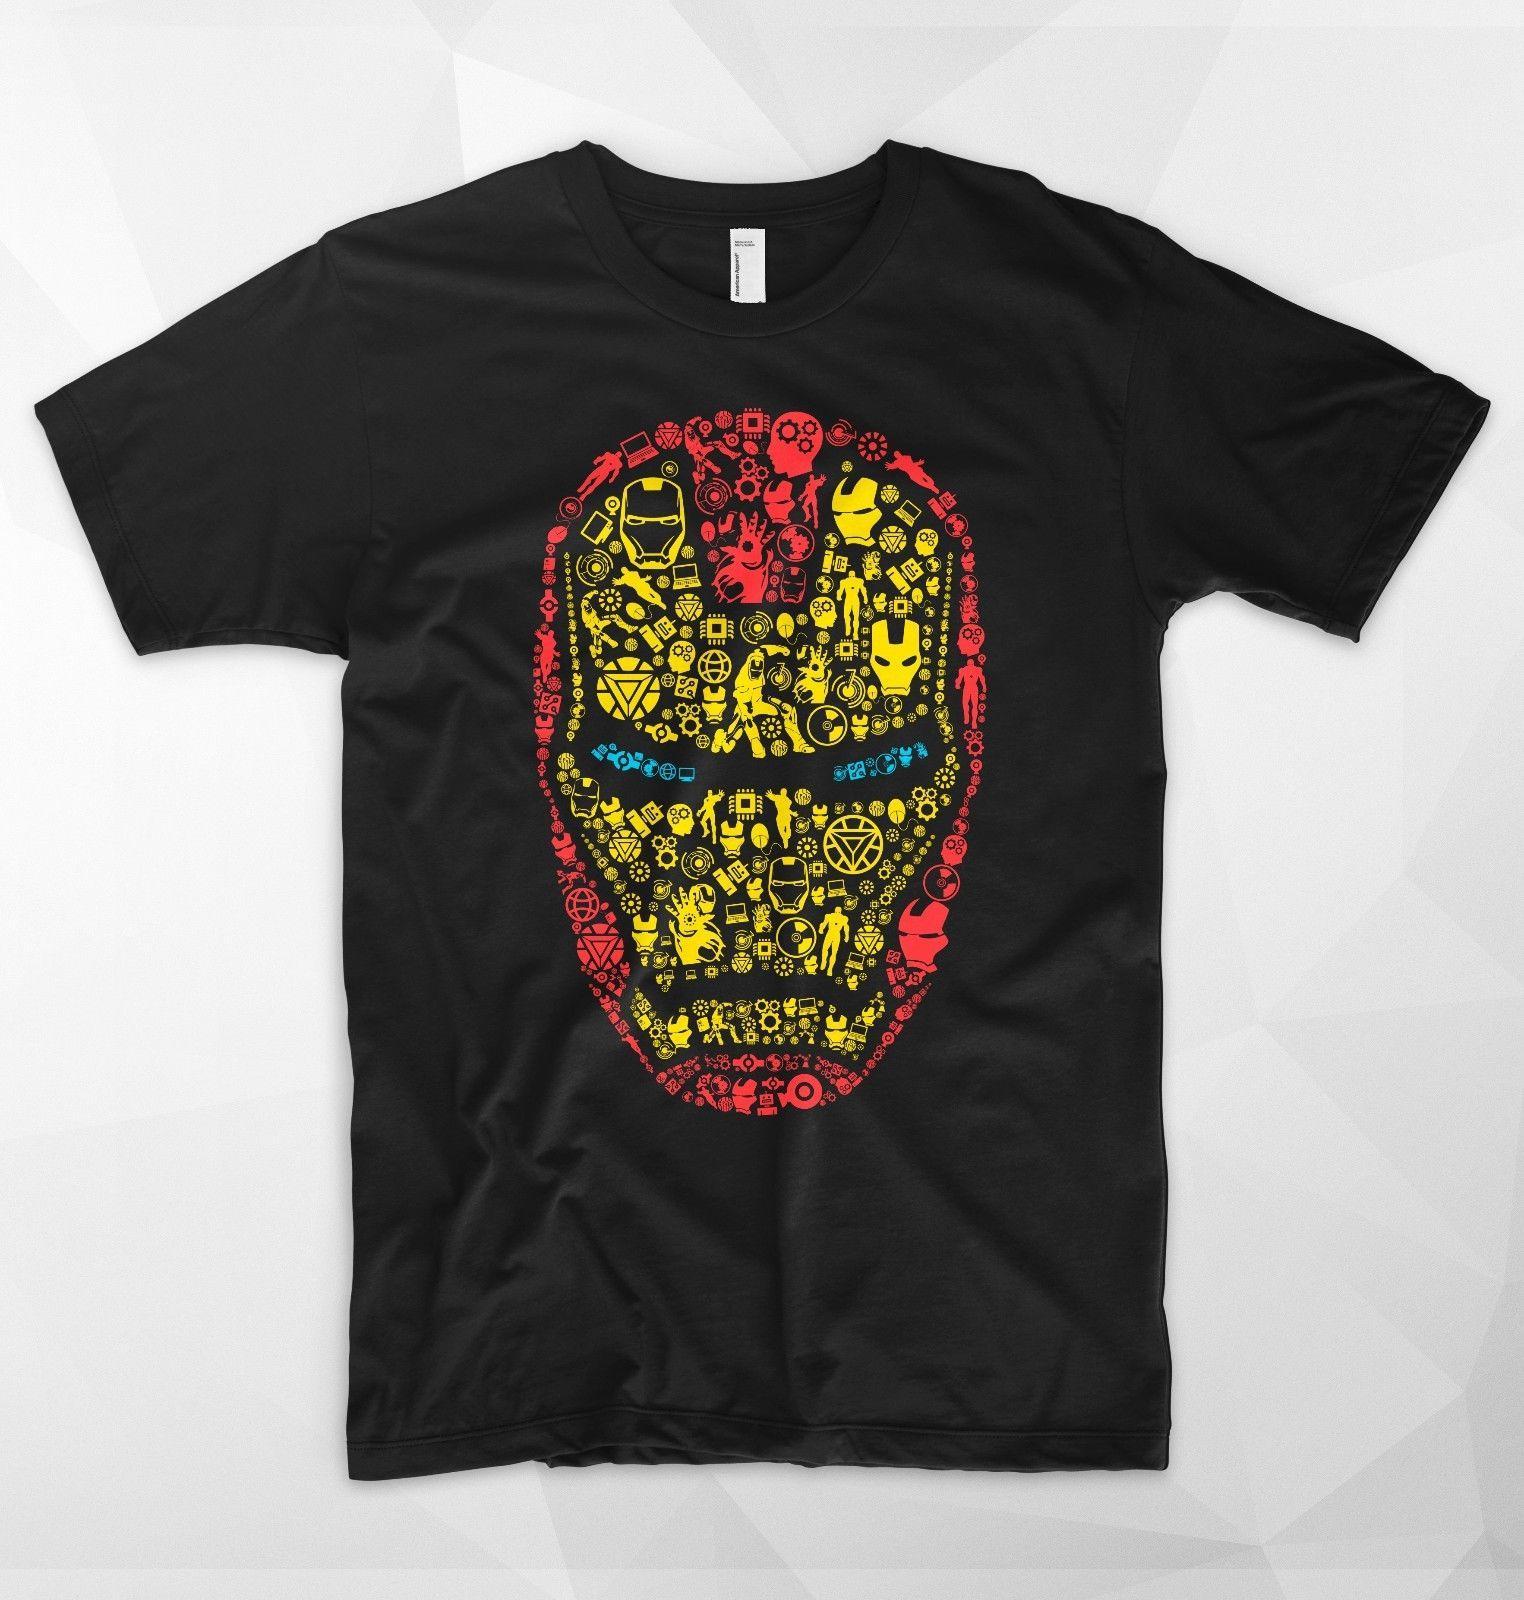 Compre Detalles Zu Iron Man Mask Camiseta Logo Head Tony Stark Marvel  Superhero Avengers Spiderman Funny A  12.96 Del Lukehappy13  5ed3f7d973876